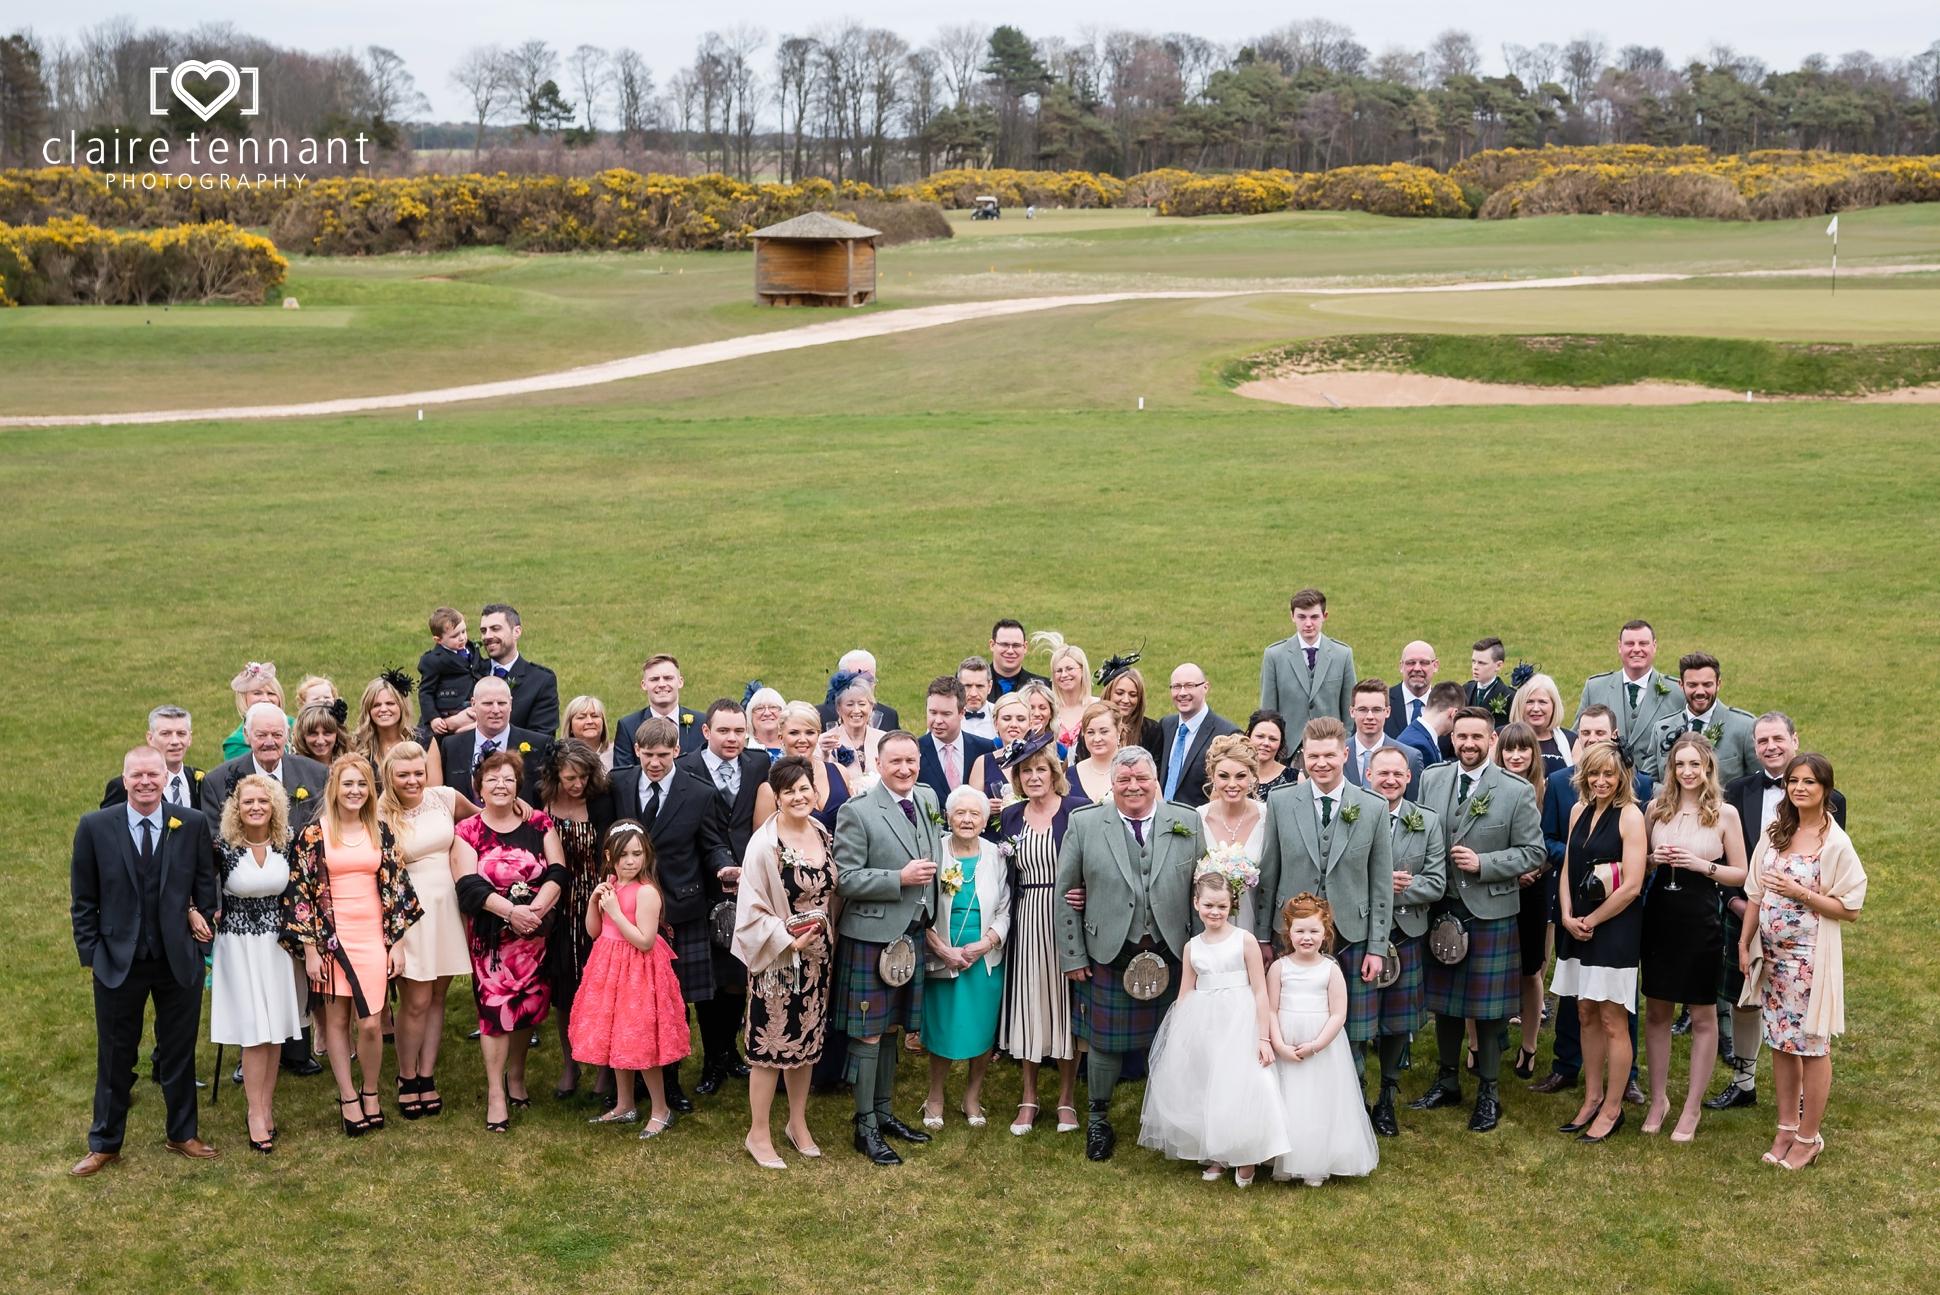 Archerfield Mansion House wedding group photo